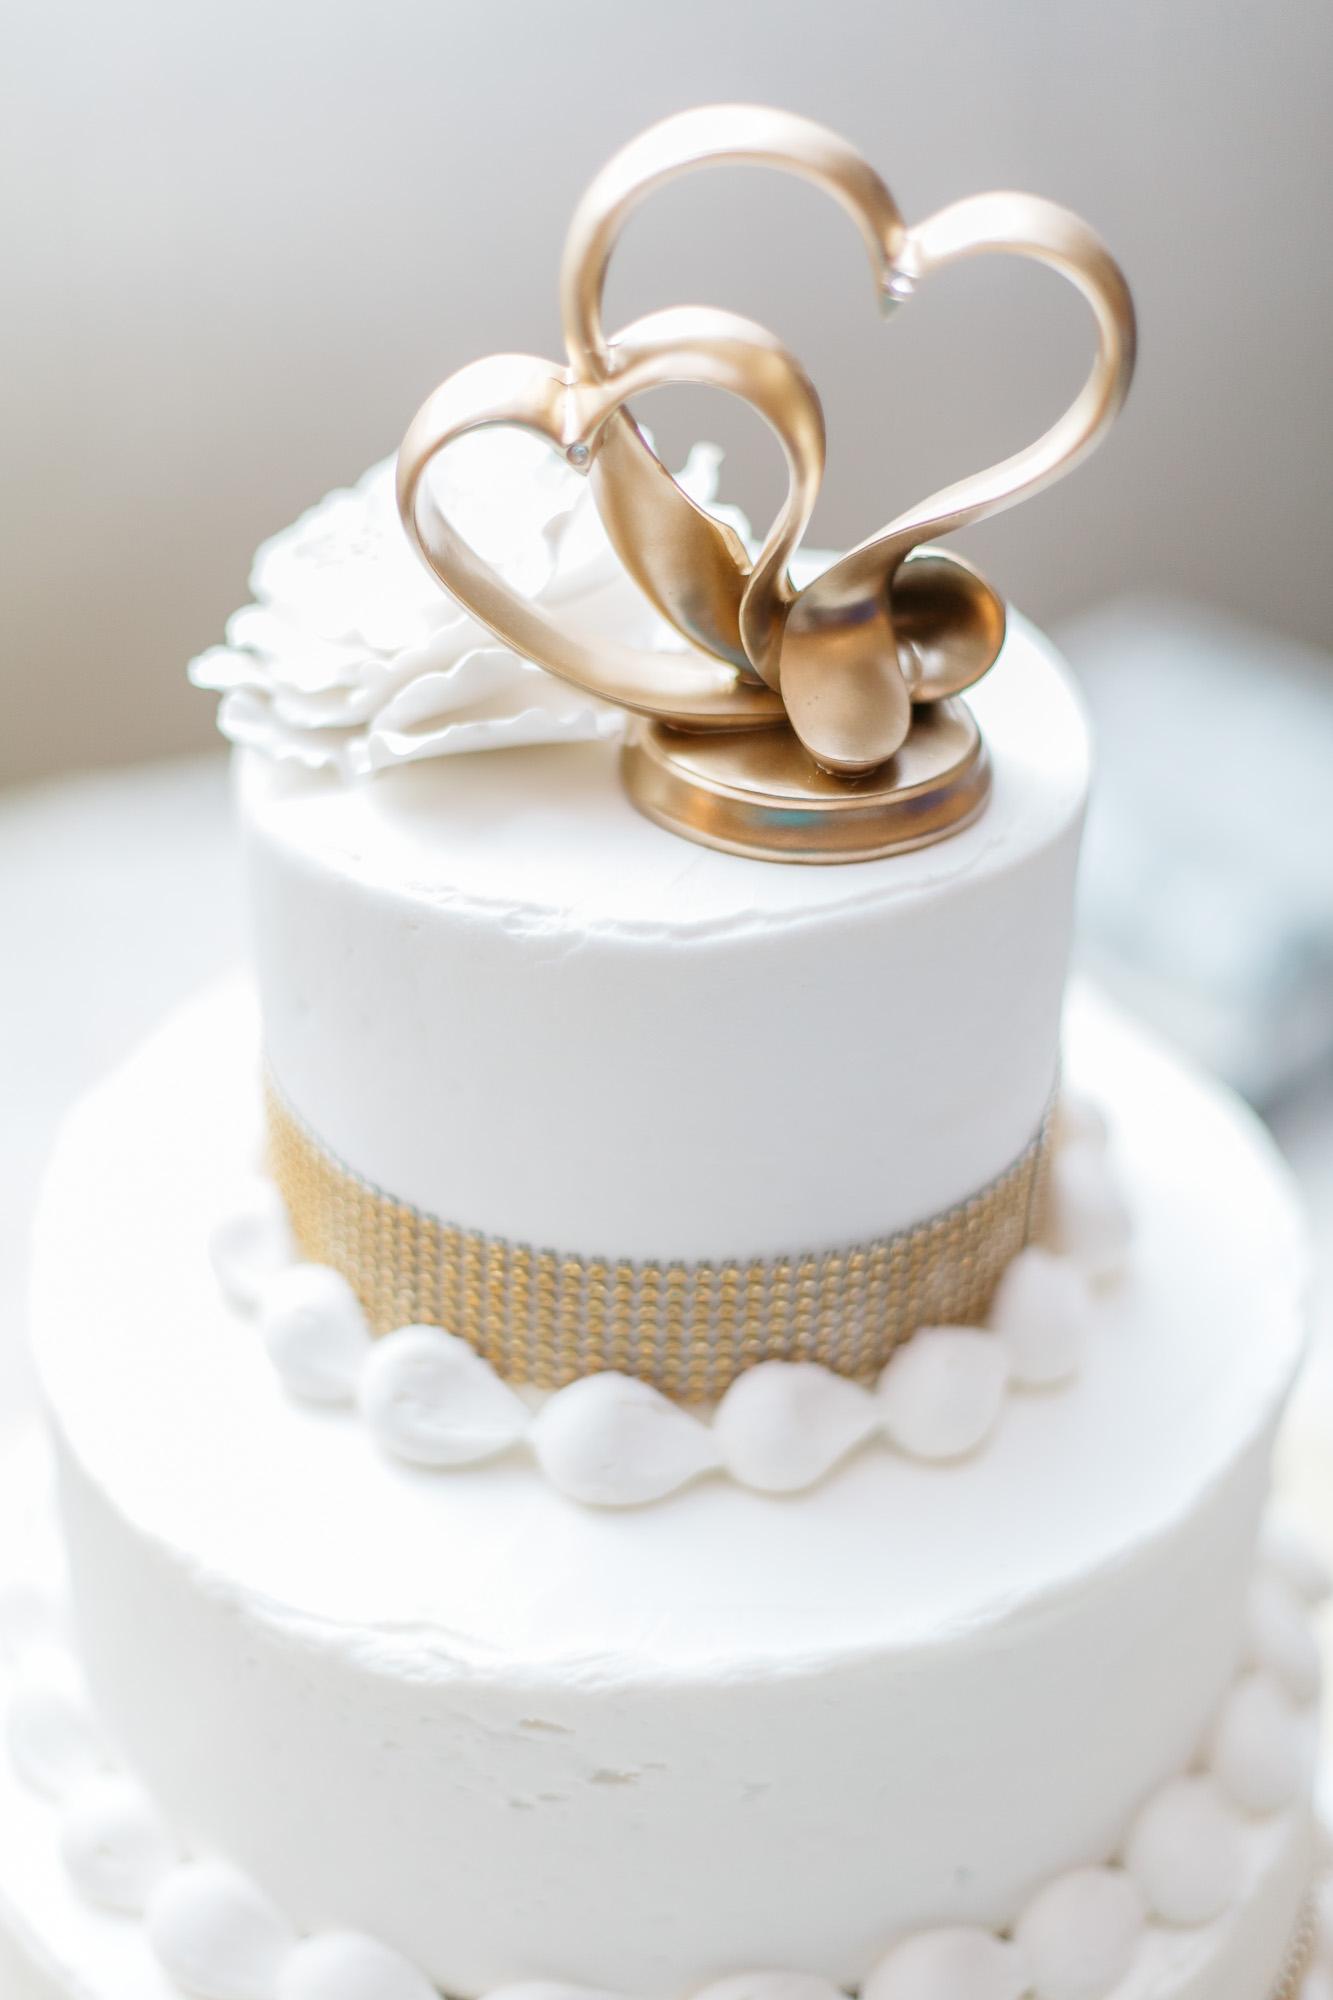 Kristin + Will   White and Gold Wedding Cake   Cornerstone Family Life Center Wedding Reception  Greenville NC Wedding Photographer   Bryant Tyson Photography   www.memoriesbybryant.com